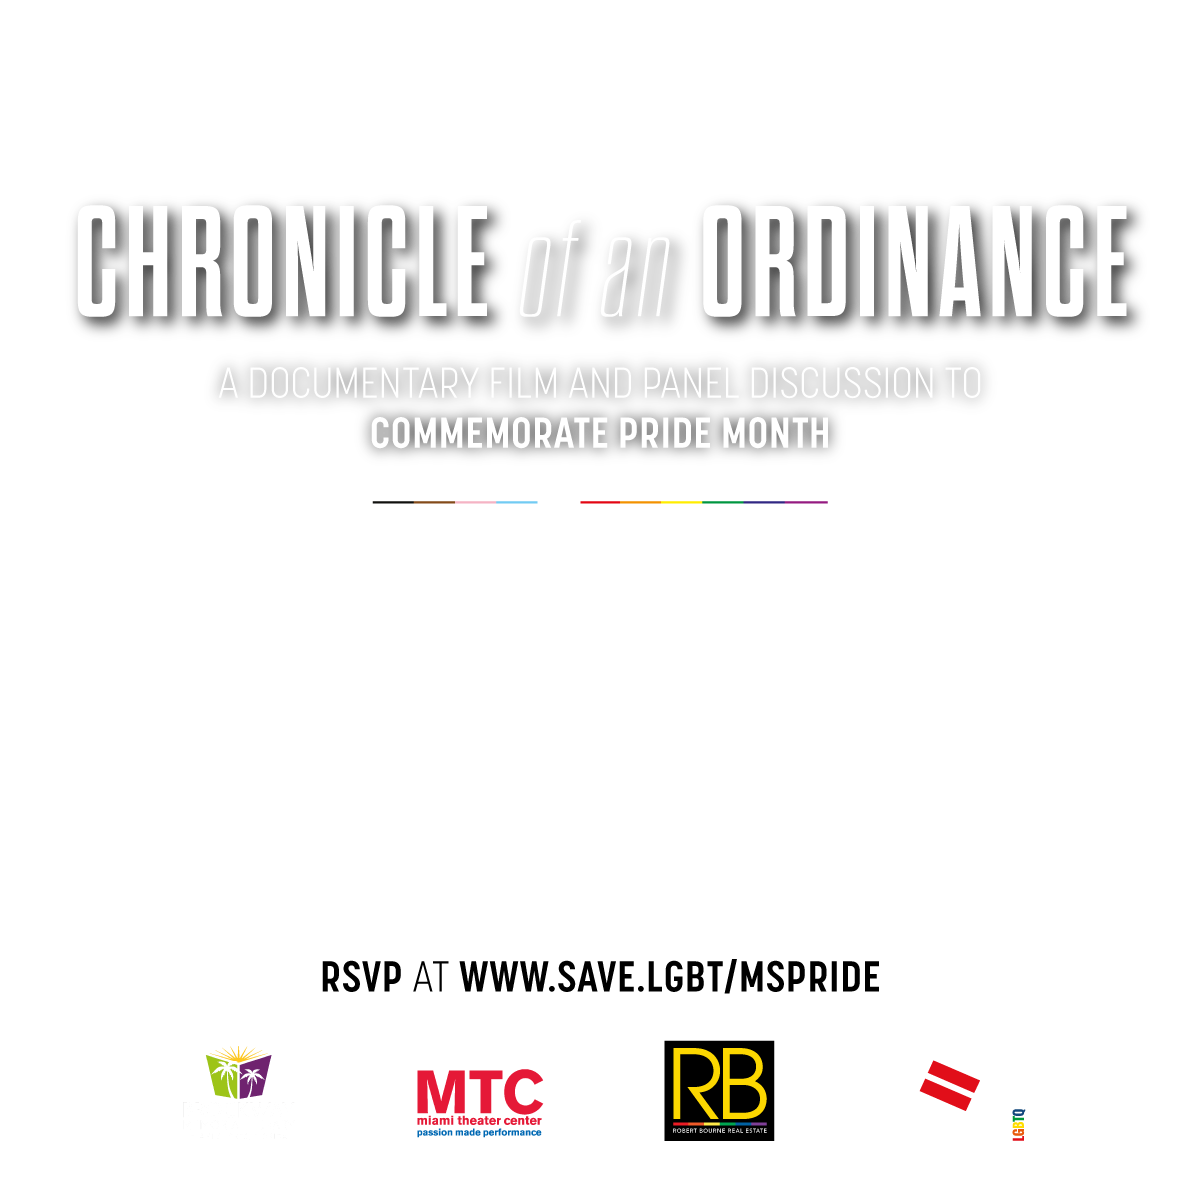 Chronicle of an Ordinance